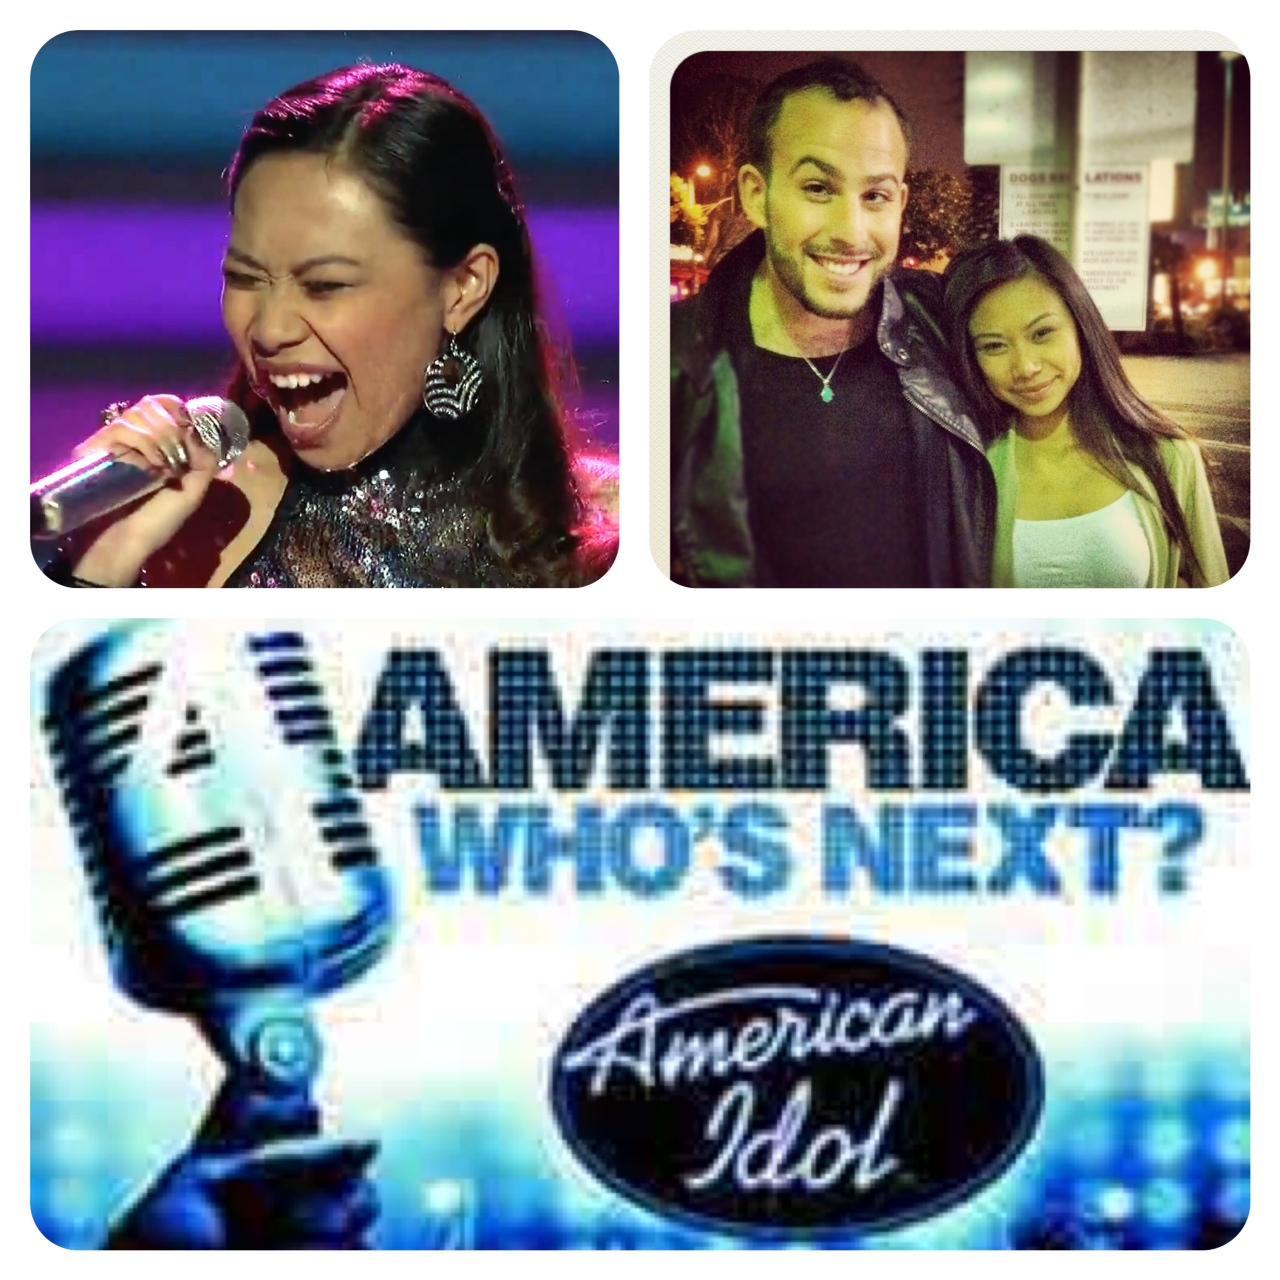 http://1.bp.blogspot.com/-1hPqXyJu27Q/T4em7ulk8uI/AAAAAAAADPI/pJsoYvzv2FQ/s1600/Jessica-Sanchez-American-Idol-Top-24-Top-12-Micah-Jesse-Ryan-Seacrest-Jennifer-Lopez-Randy-Jackson-Steven-Tyler.jpg